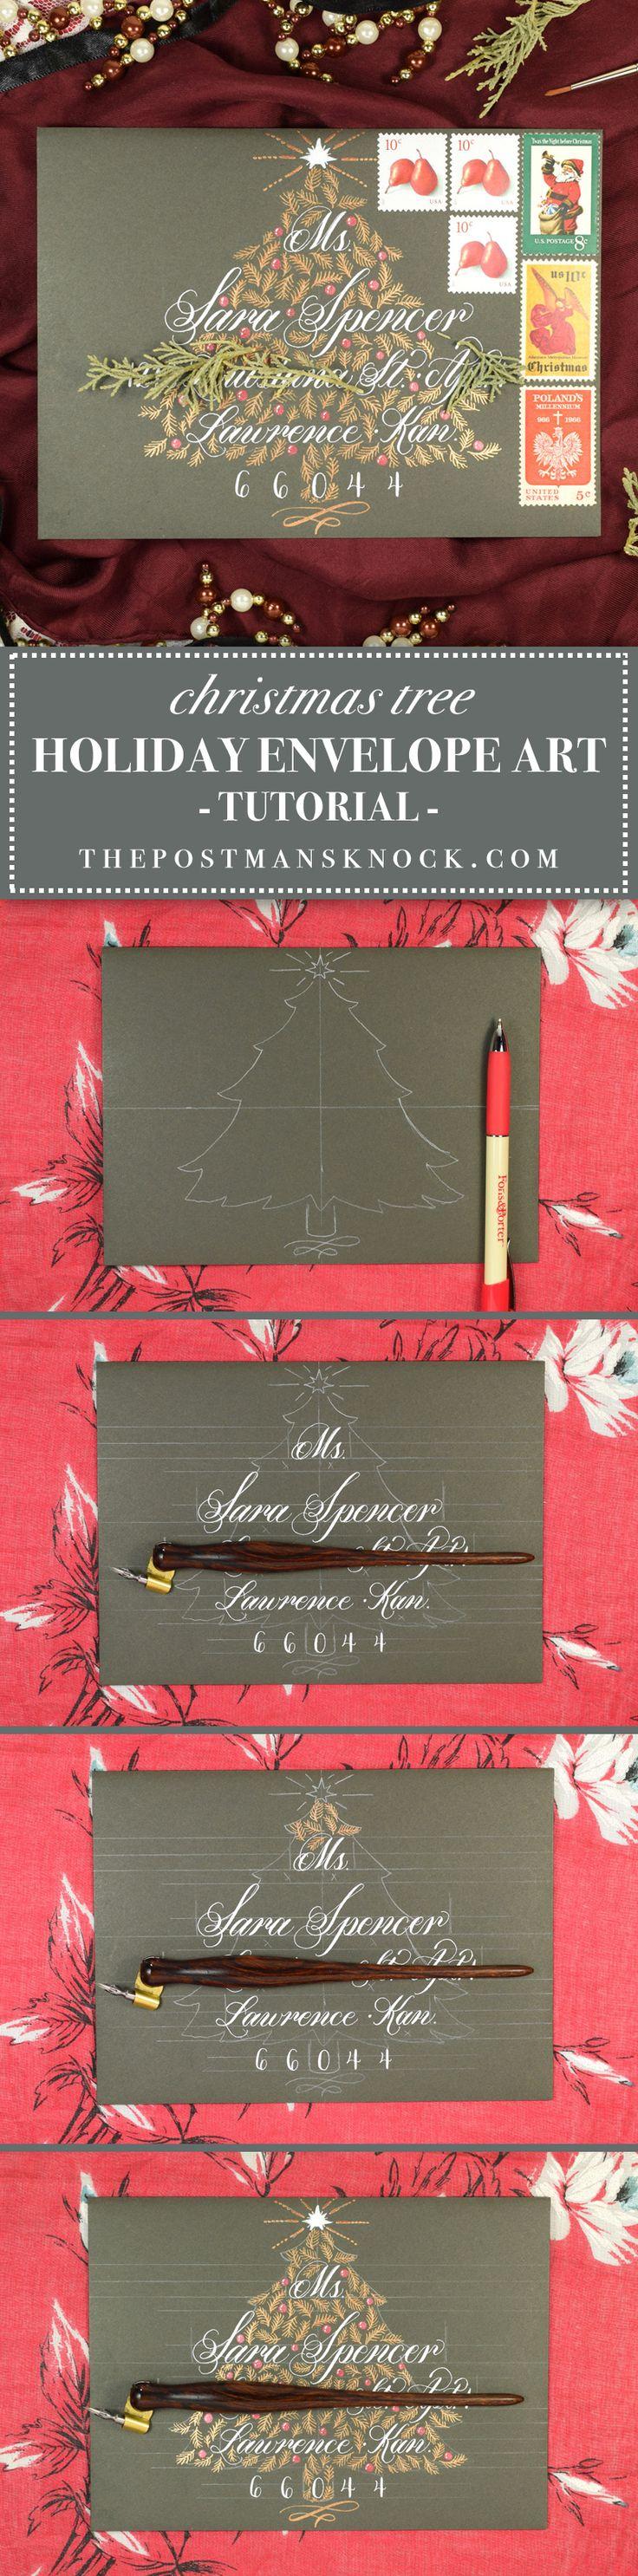 1067 best Addressing envelopes images on Pinterest | Envelope art ...